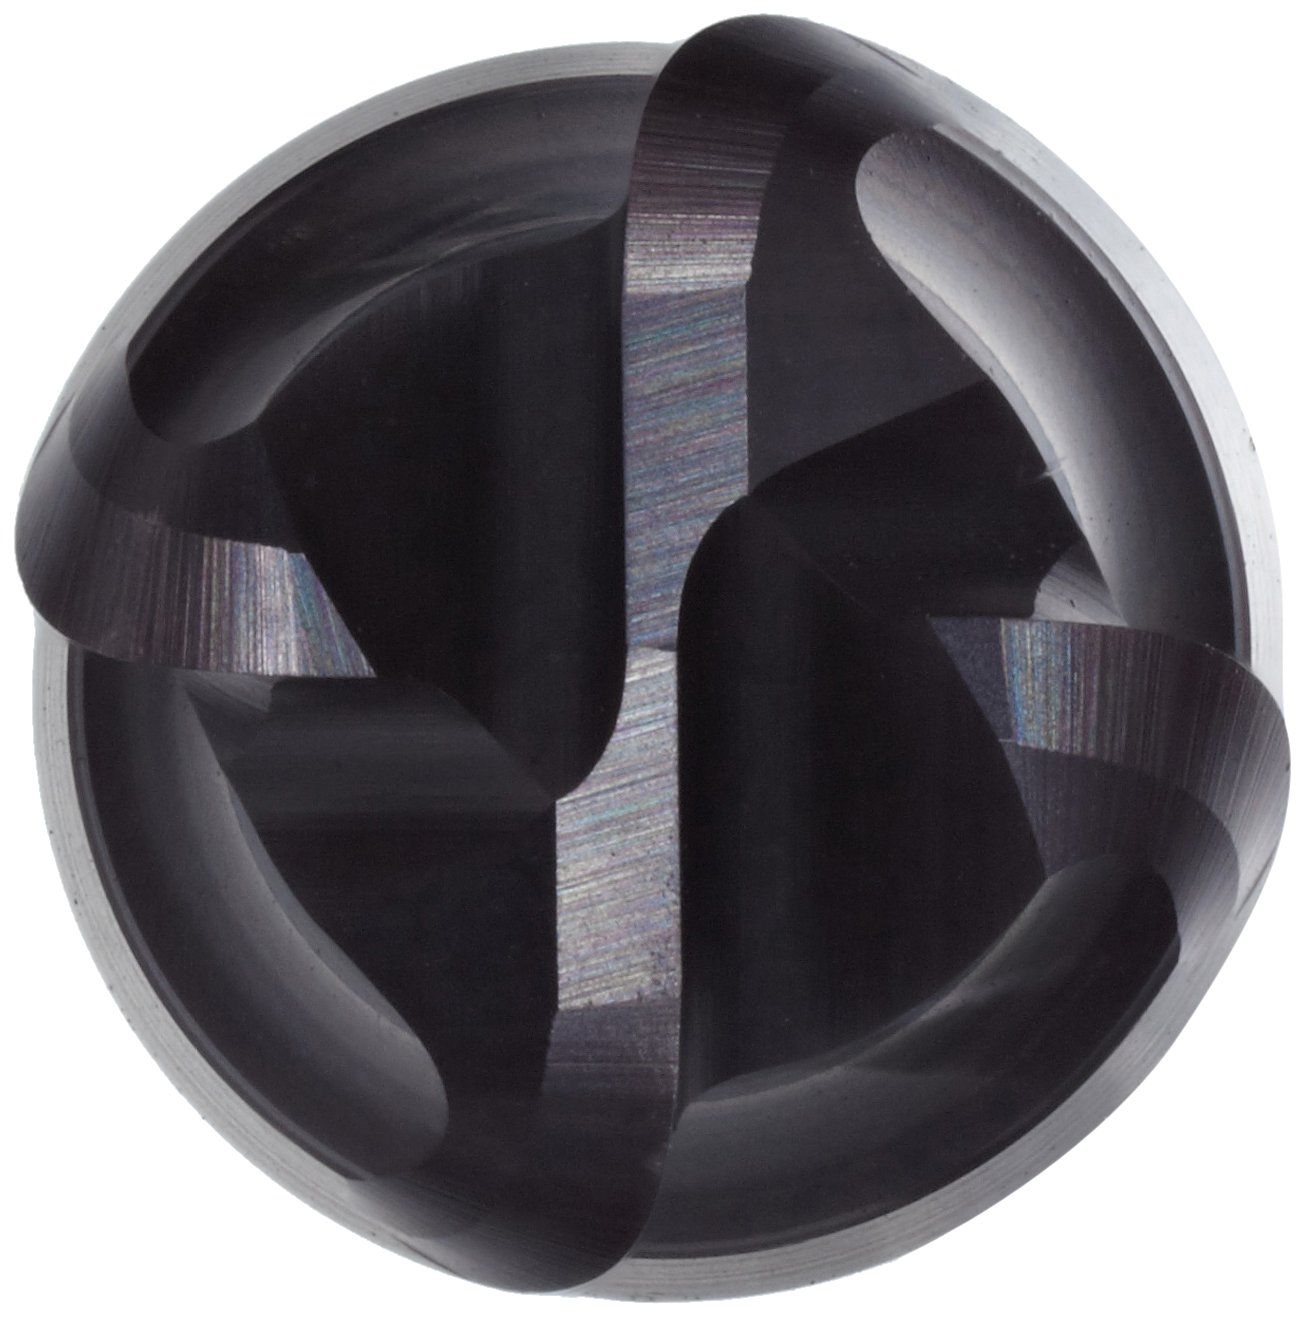 Sandvik Coromant R216.24 Carbide Corner Radius End Mill 3mm Cutting Diameter 57mm Overall Length 6mm Shank Diameter TiAlN Monolayer Finish Metric 0.5mm Corner Radius 50 Deg Helix 4 Flutes Roughing Cut